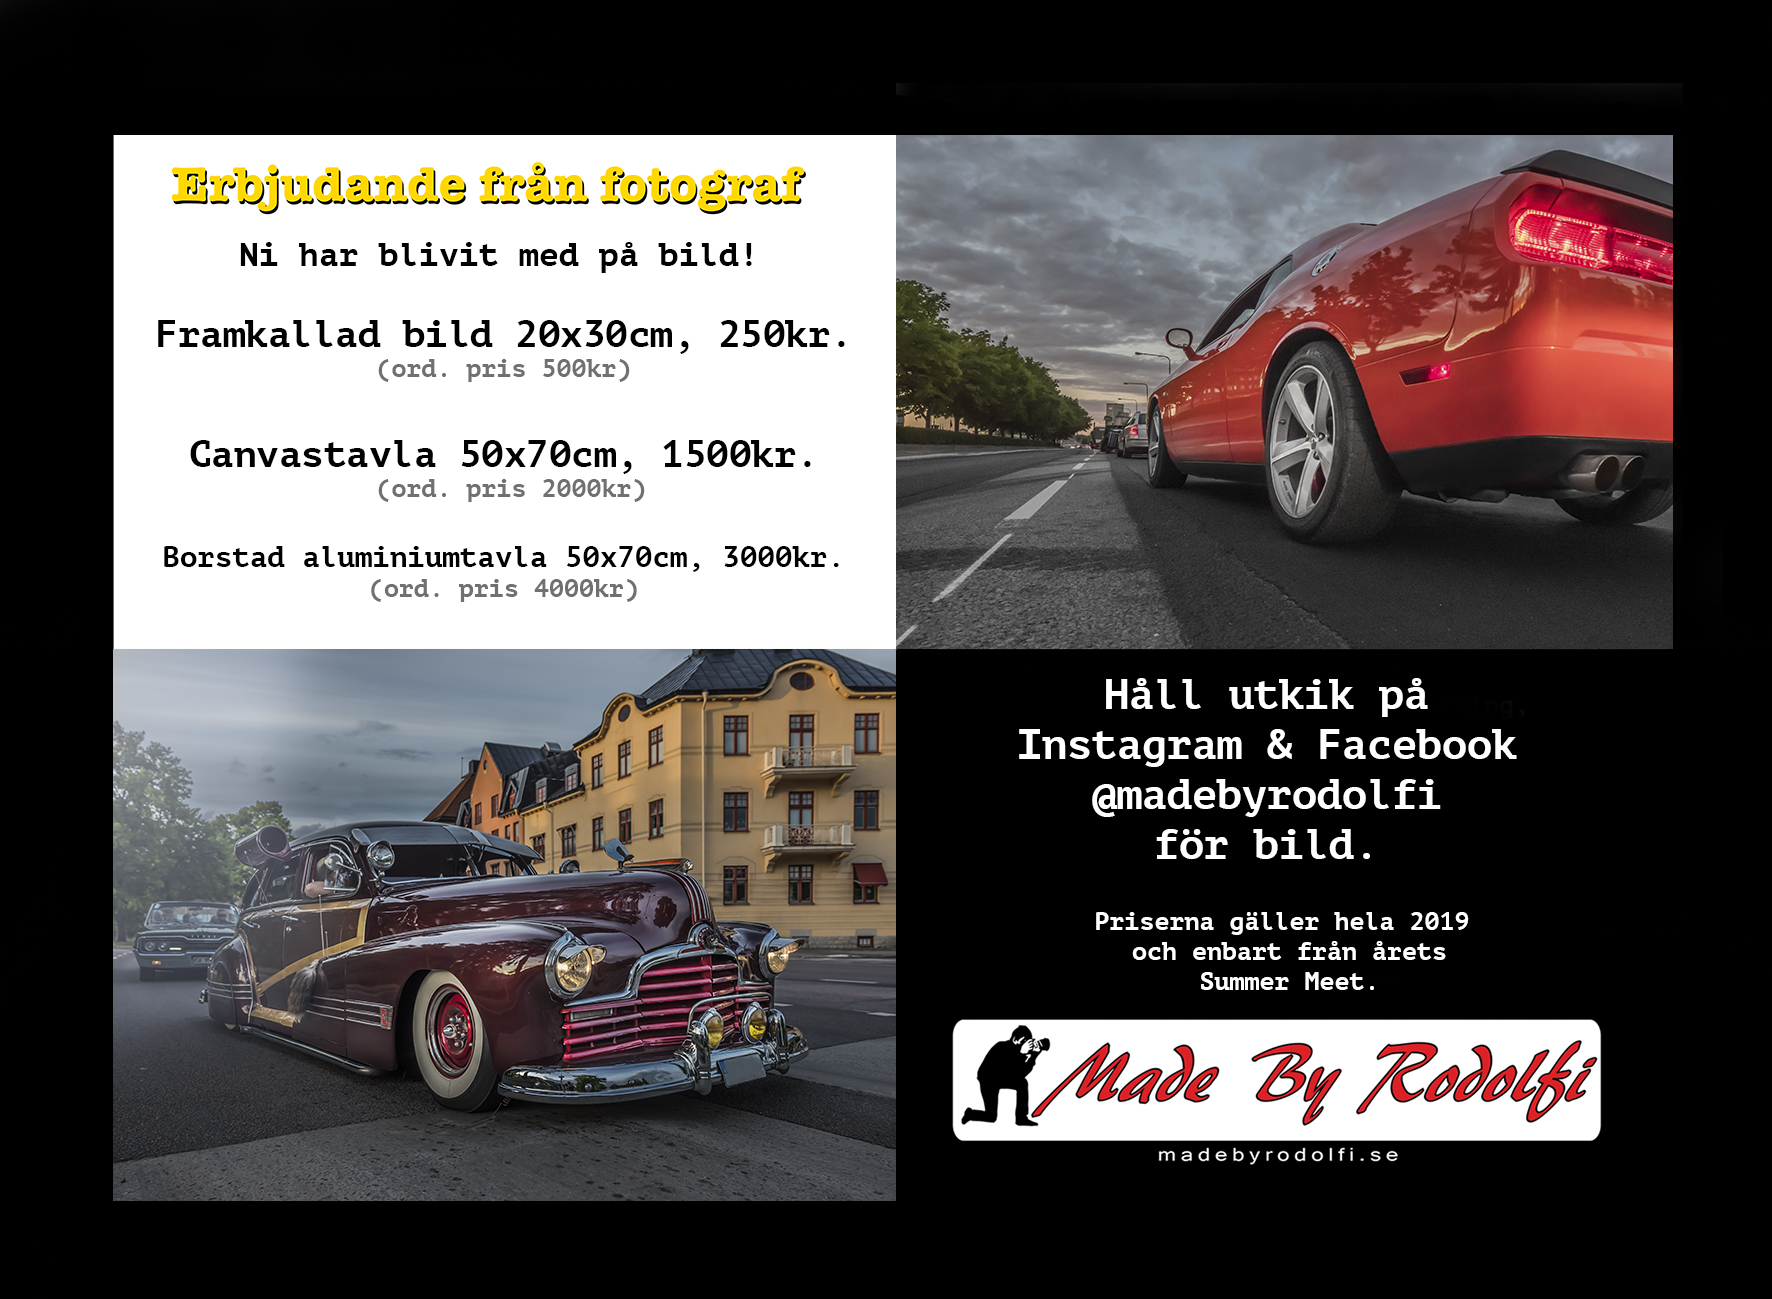 #mxsm2019 #mxsm #svemo #motocross #smcross #madebyrodolfi #motocross